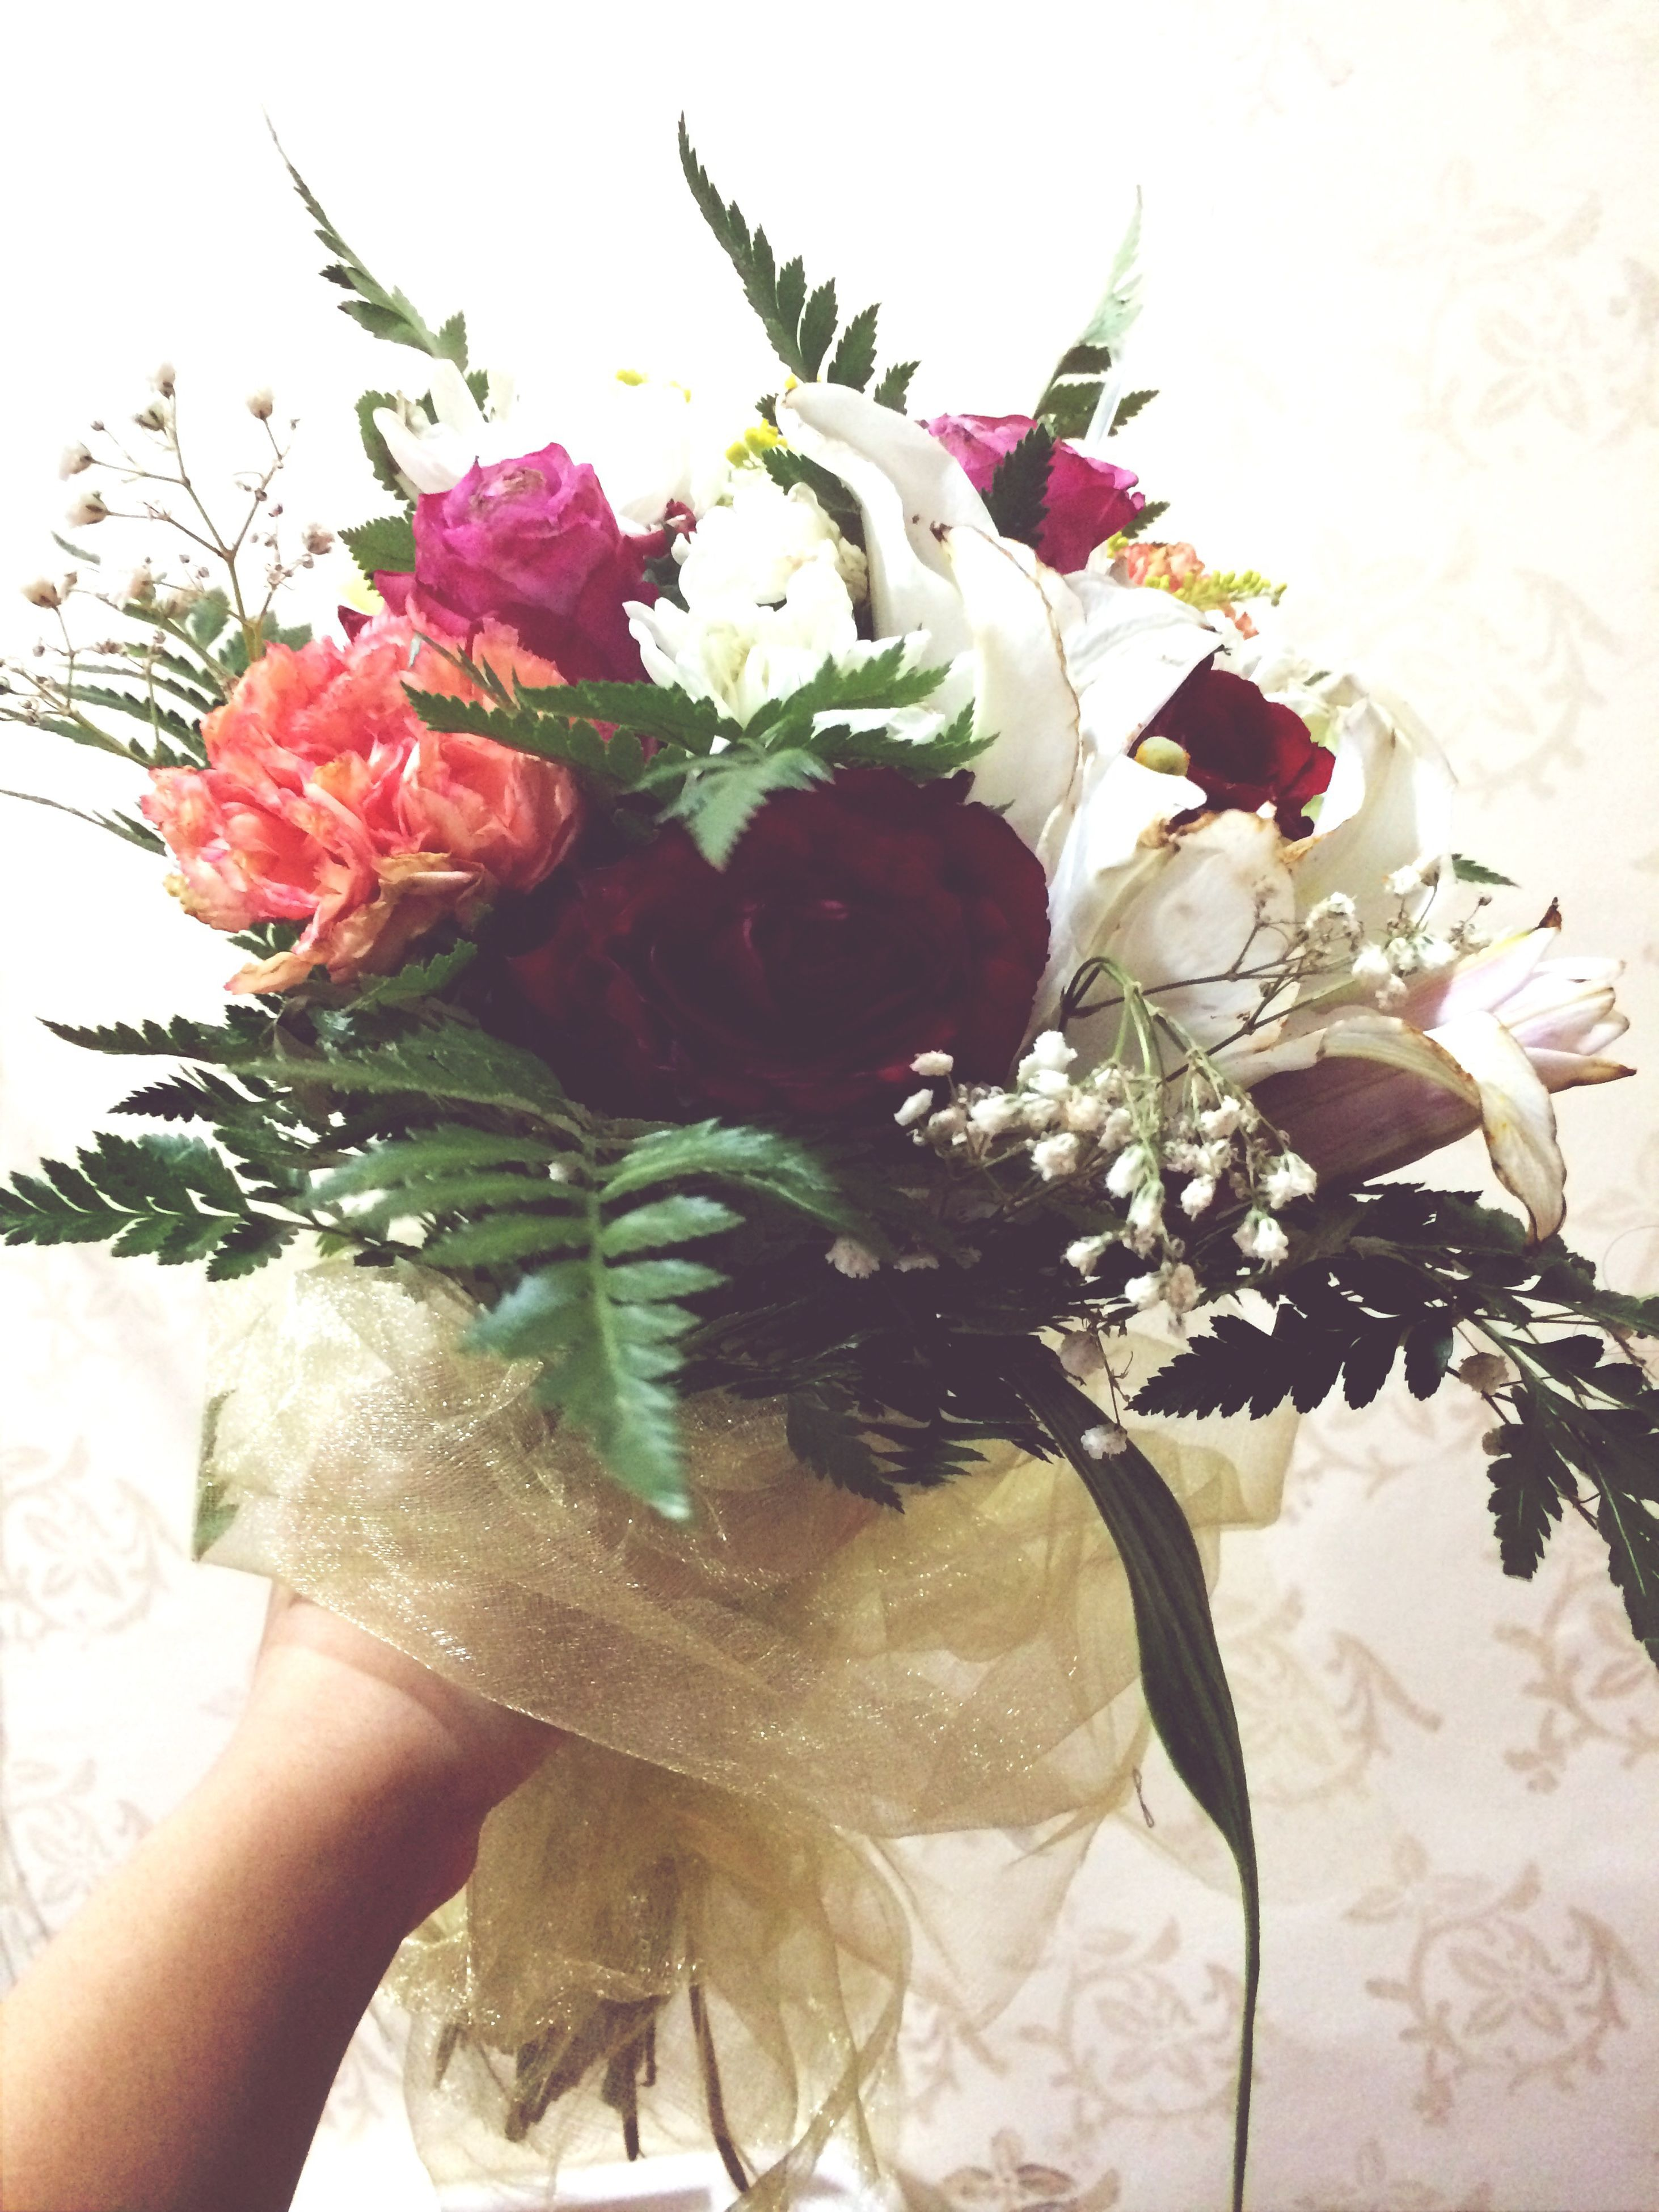 flower, freshness, petal, fragility, vase, indoors, flower head, bouquet, rose - flower, decoration, beauty in nature, leaf, bunch of flowers, flower arrangement, plant, nature, close-up, table, pink color, white background